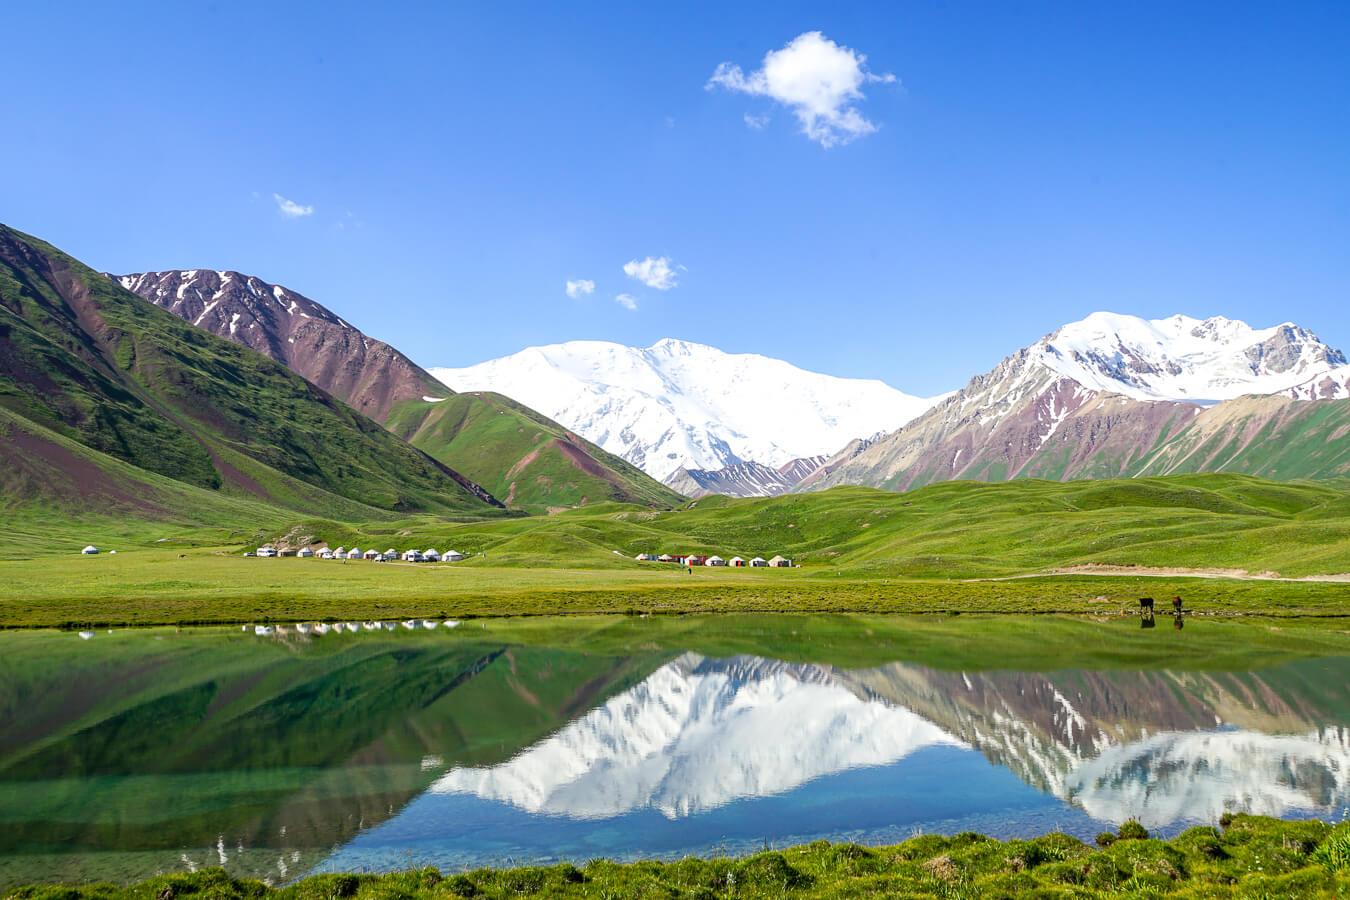 Tulpar kul lake in southern Kyrgyzstan